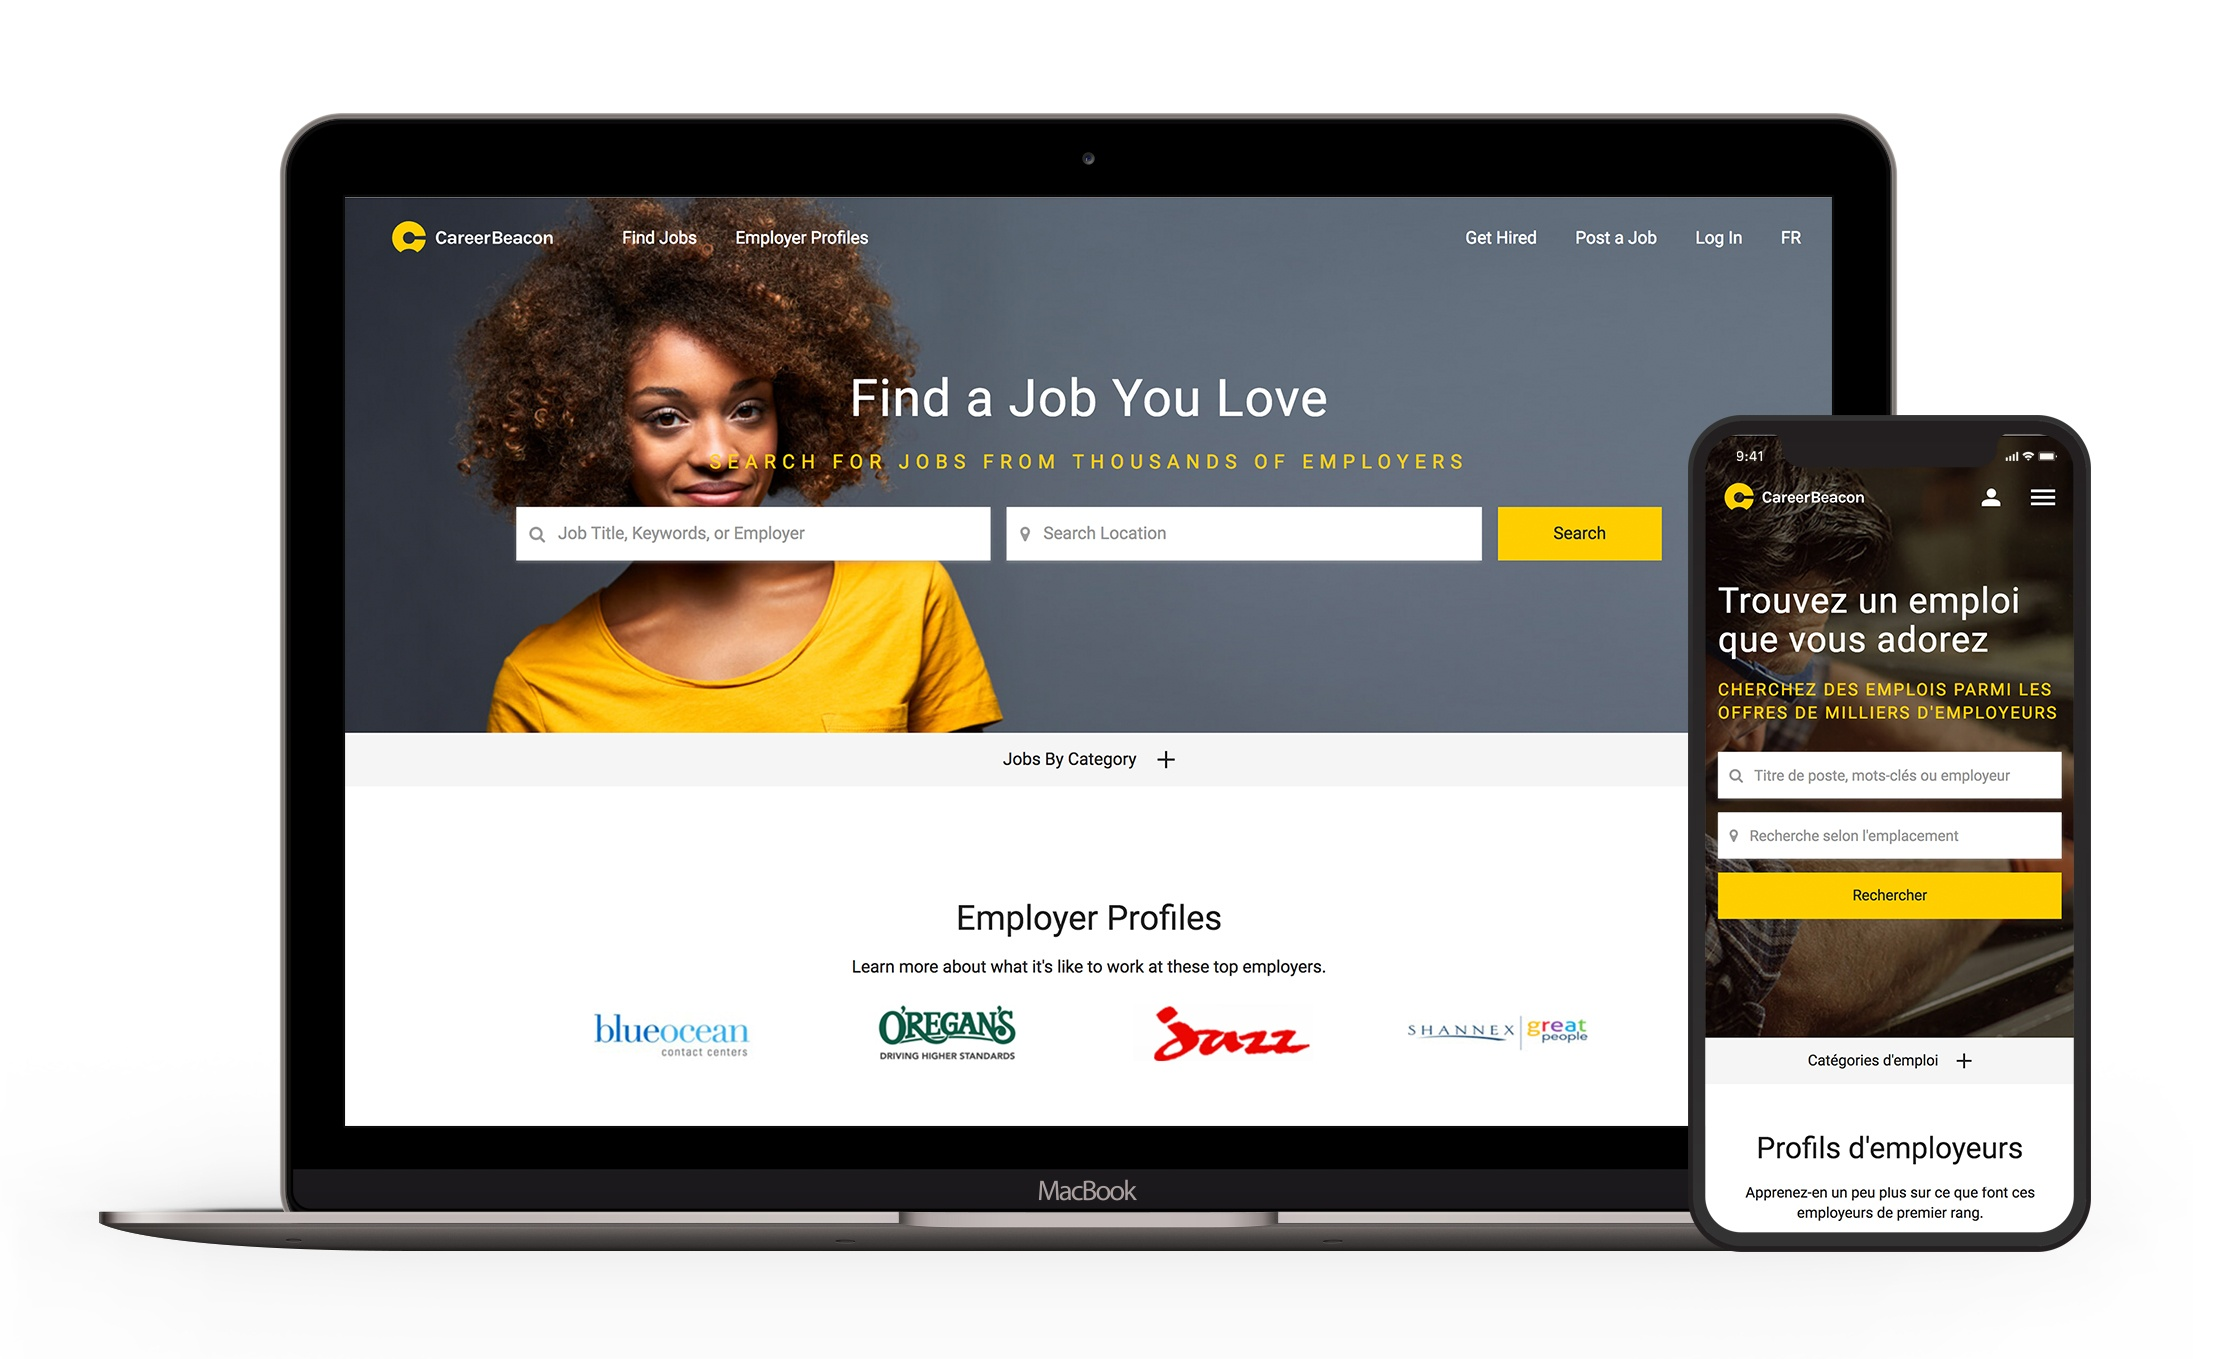 CareerBeacon homepage